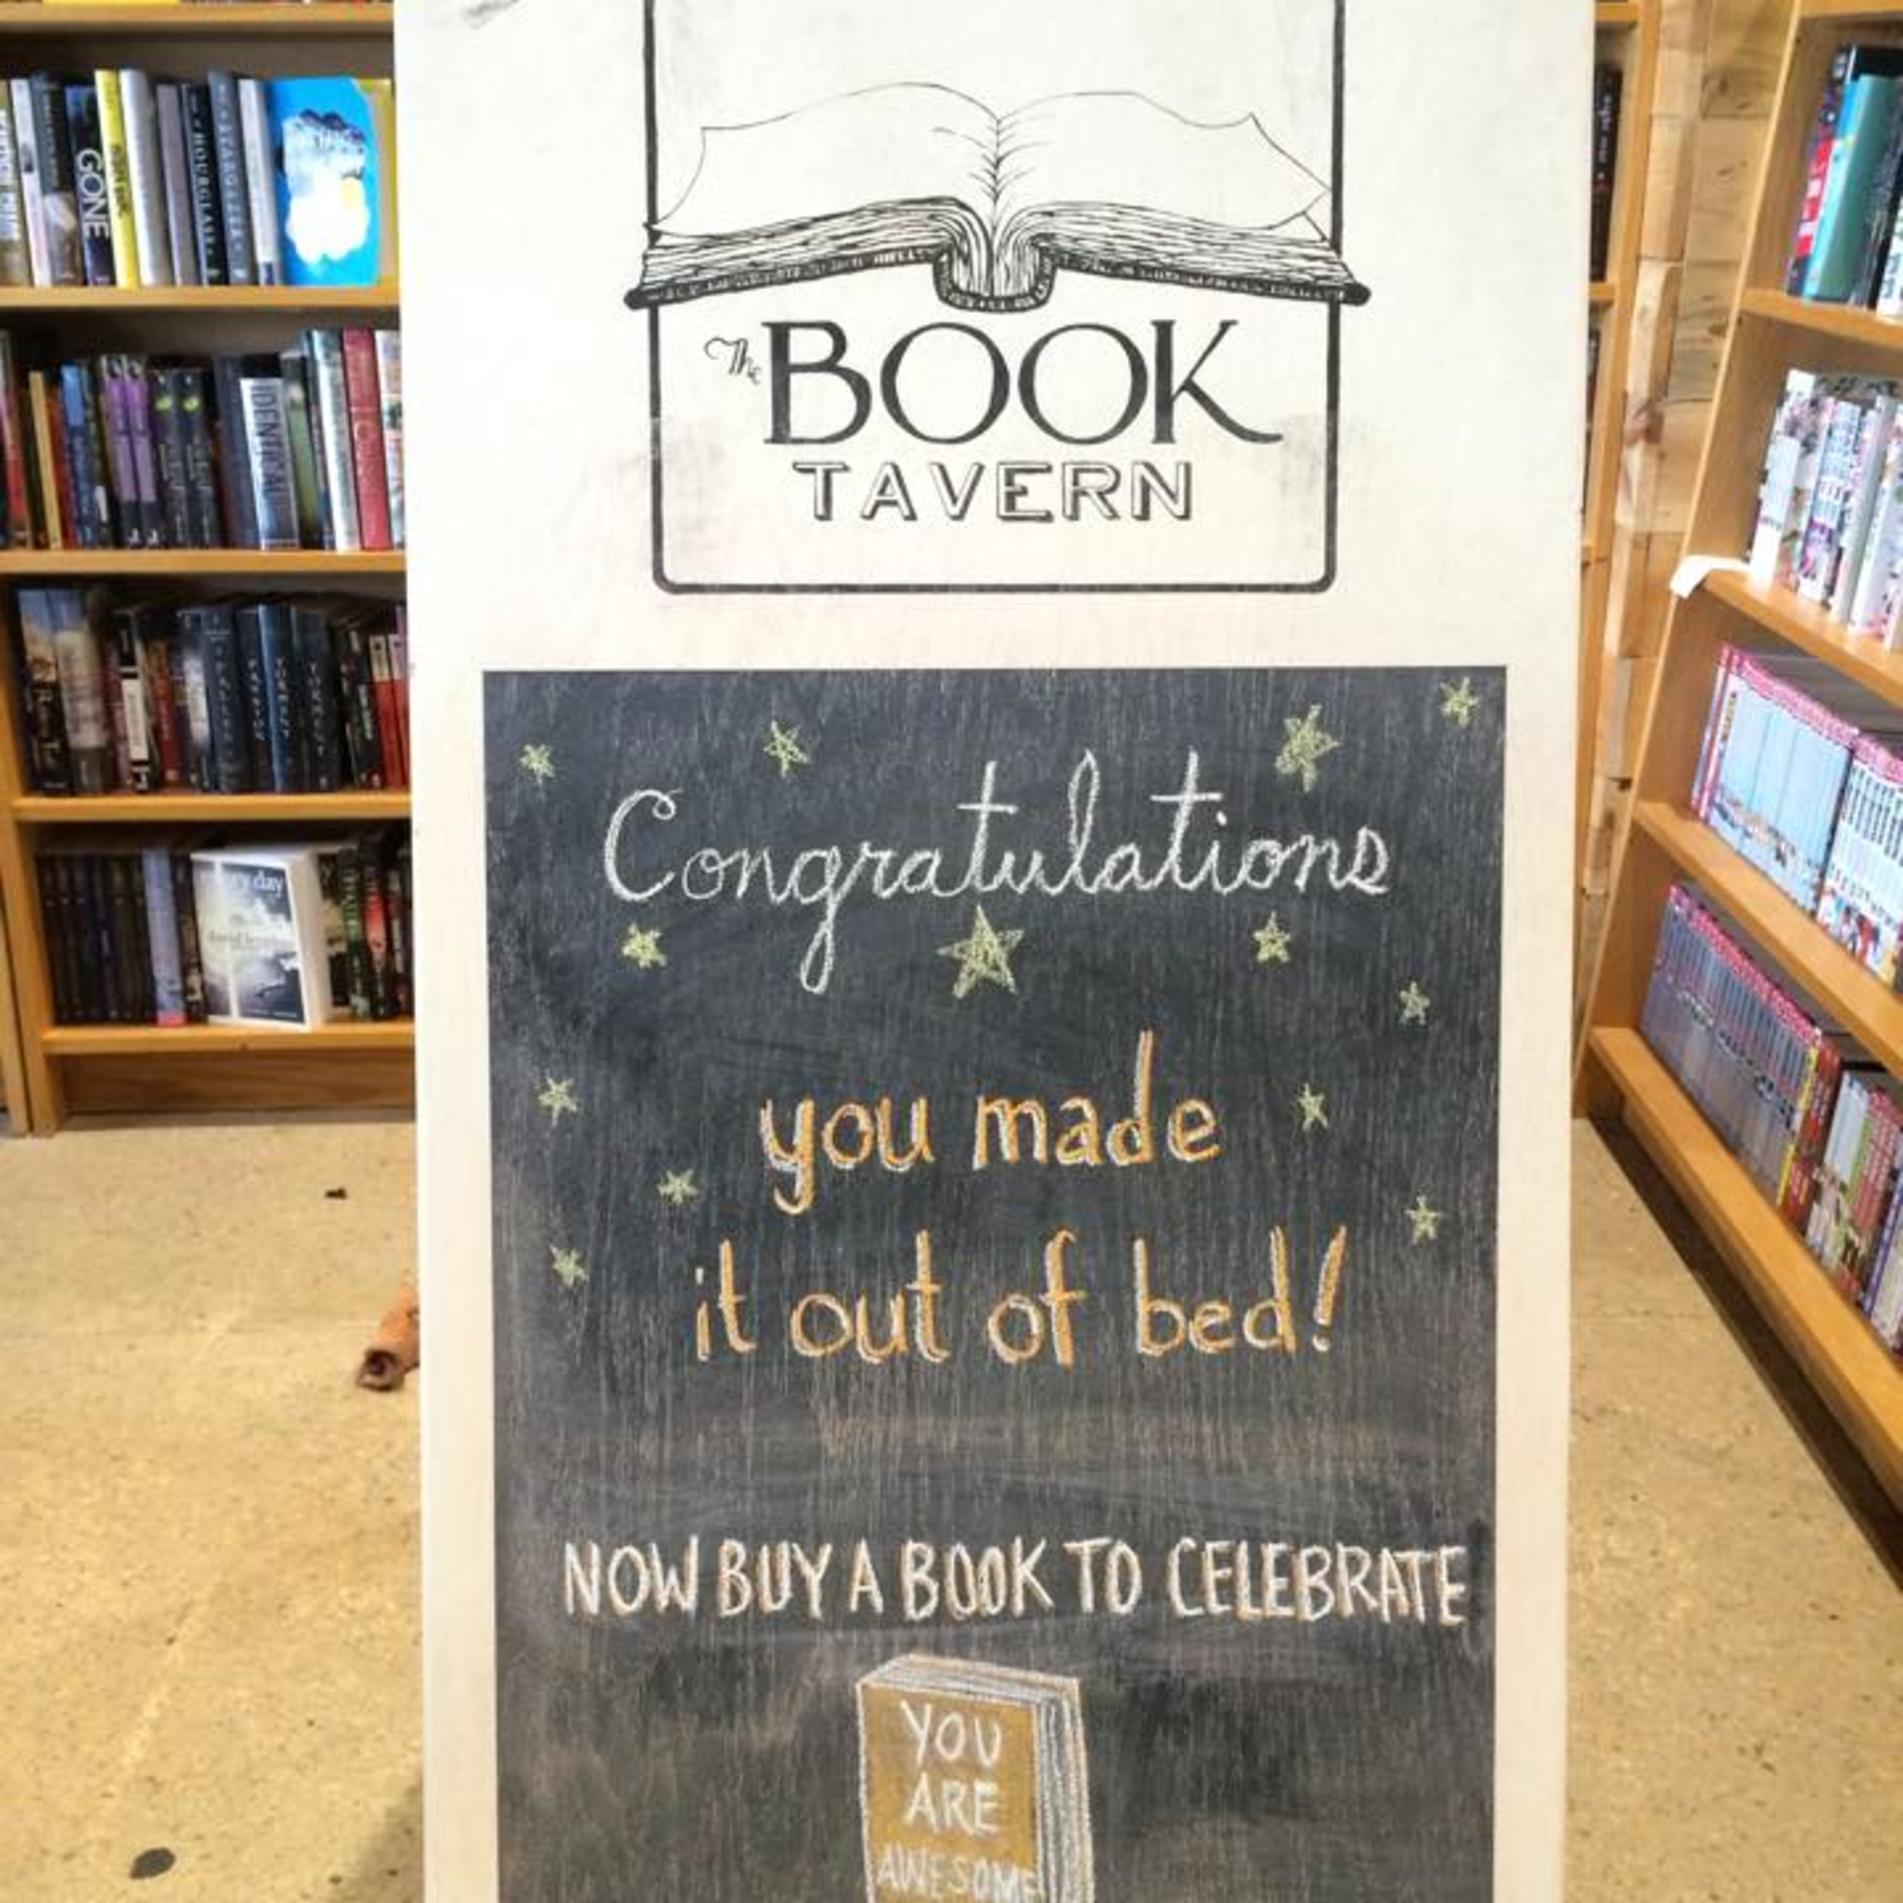 The Book Tavern